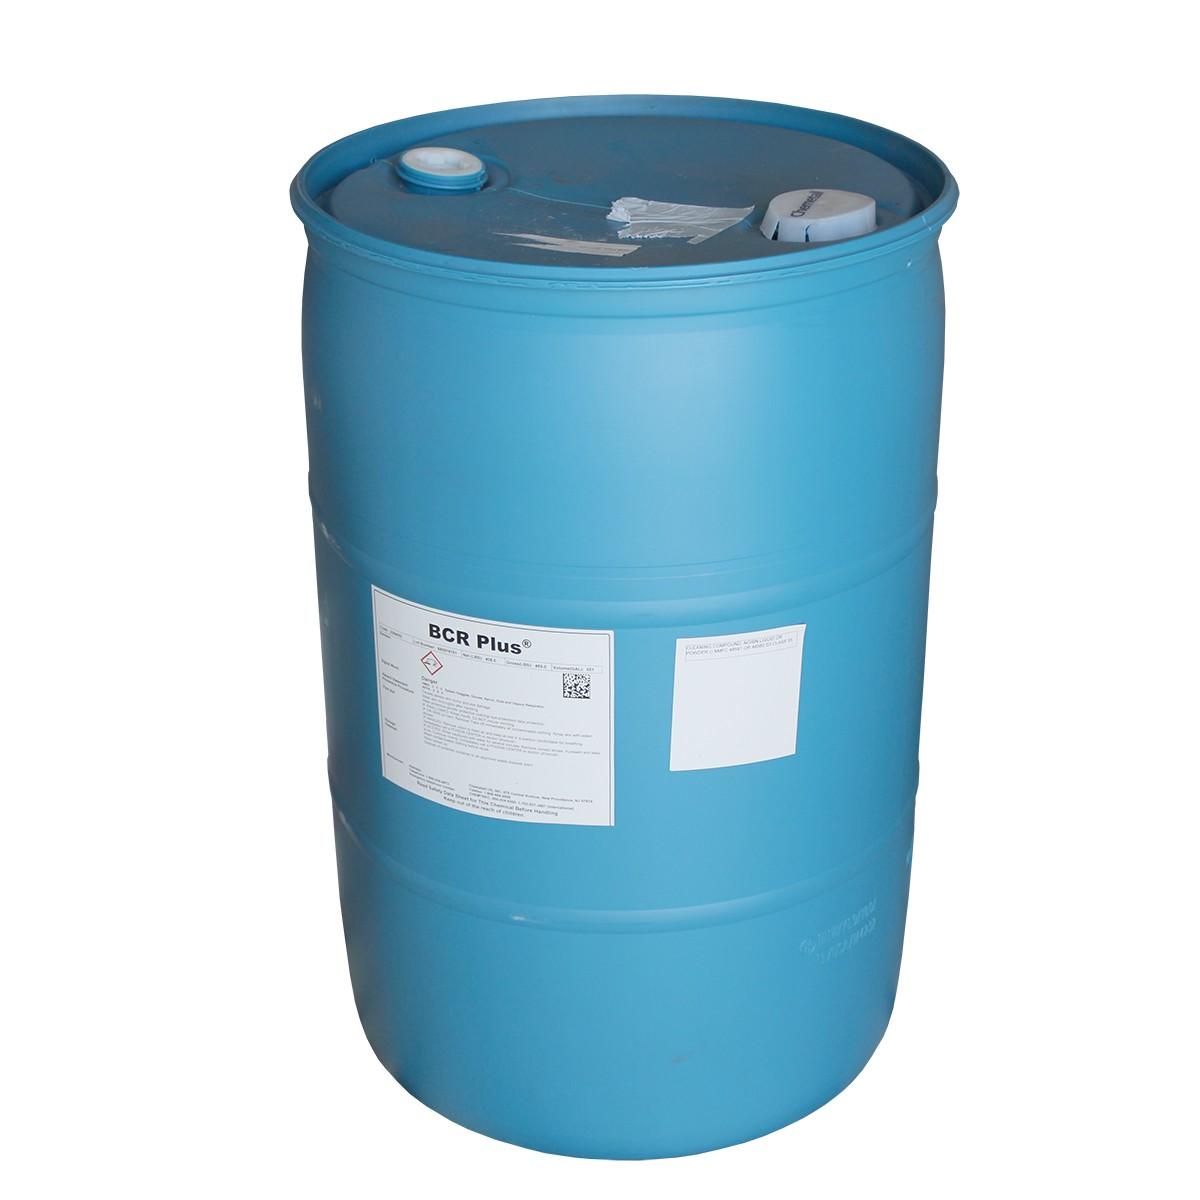 BCR Plus Ultrasonic Solution - 51 Gallon